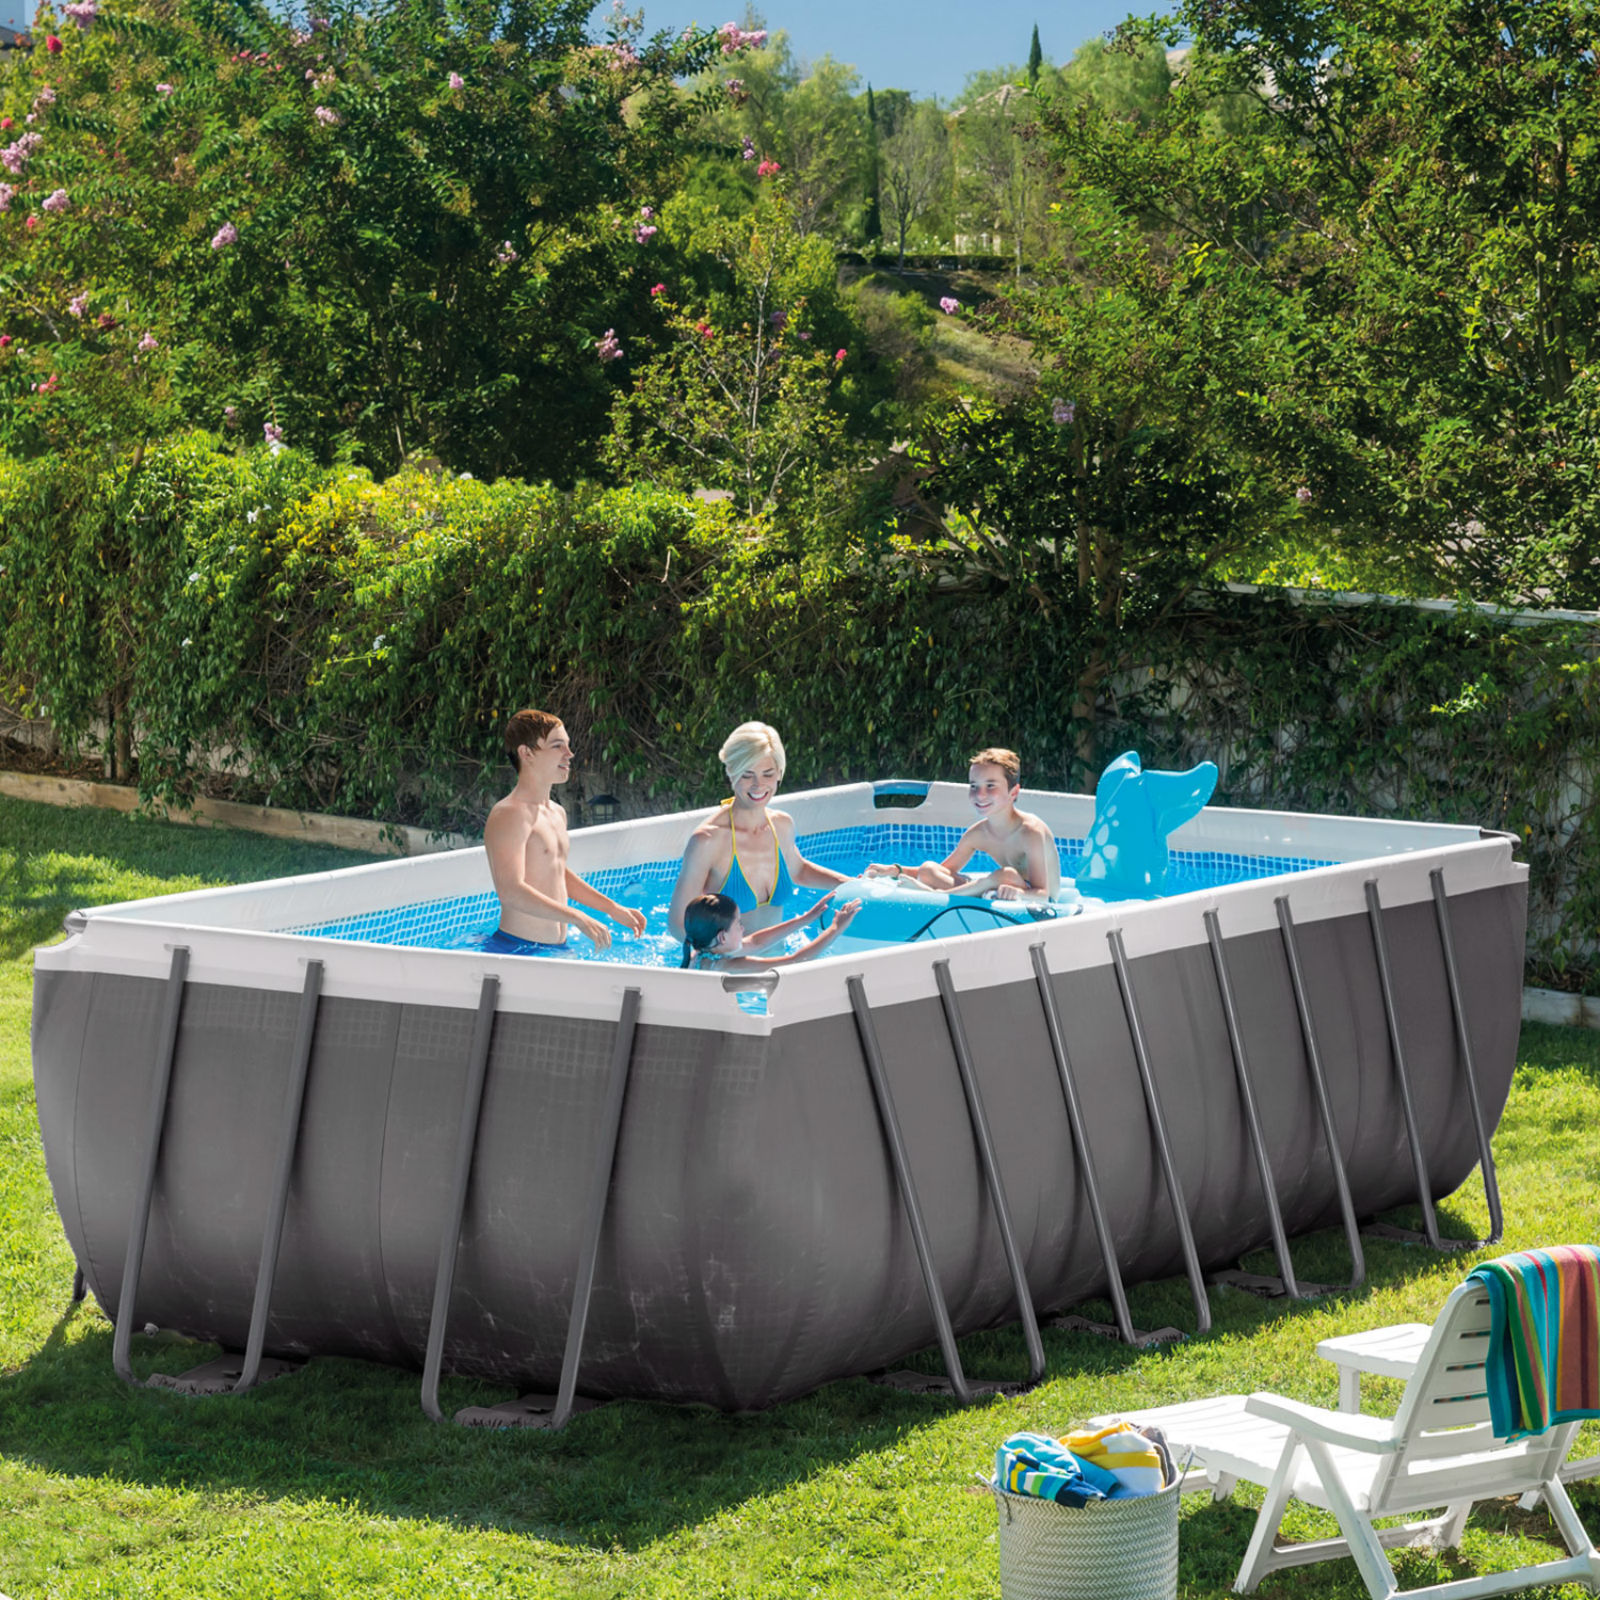 Intex 18 39 x 9 39 x 52 rectangular ultra frame pool with for Intex pool aktion